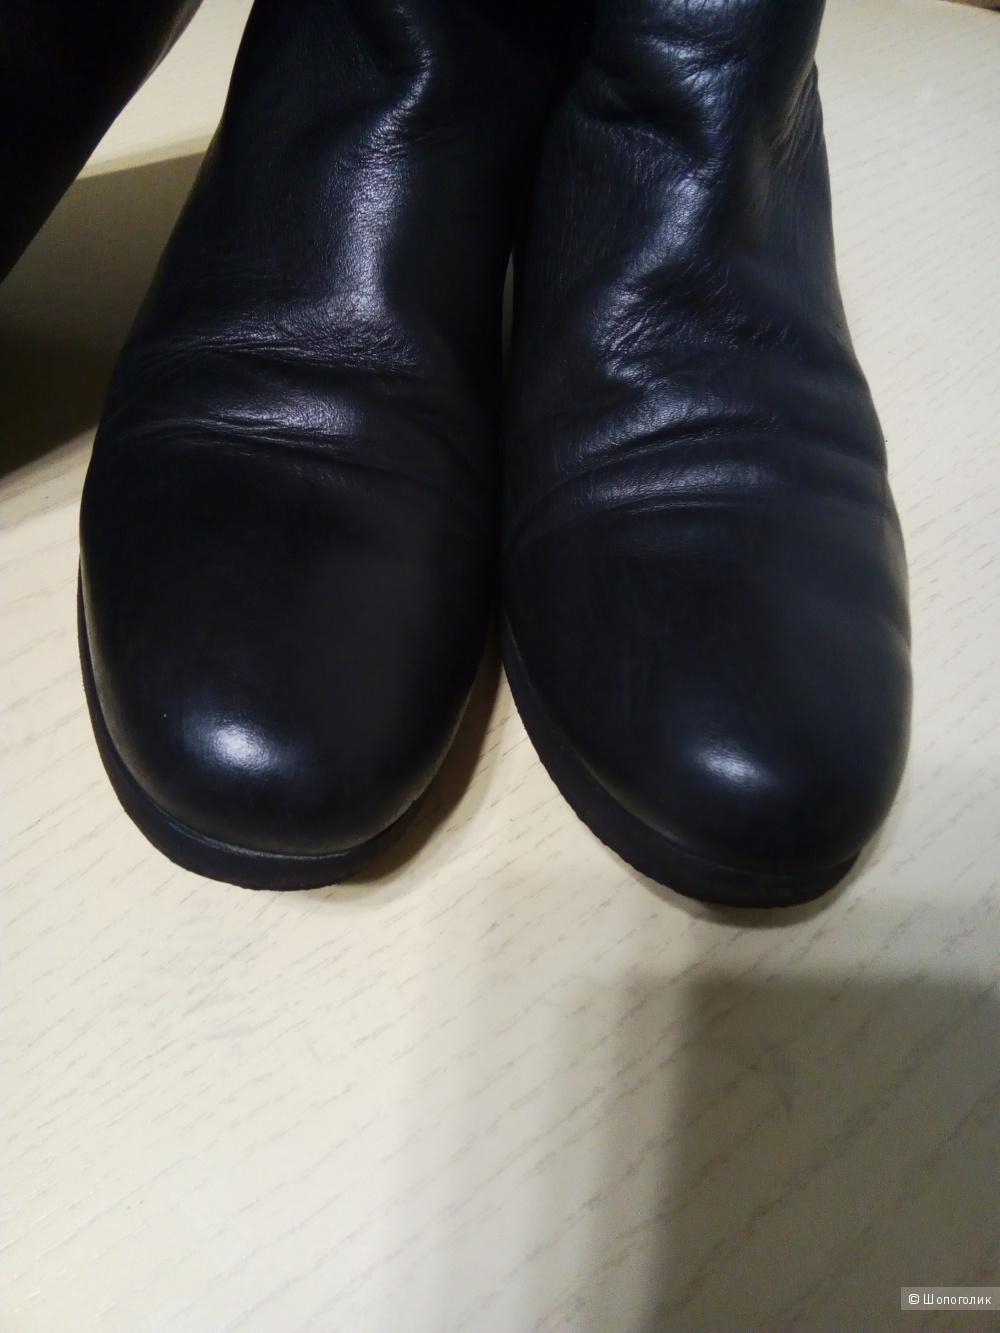 Cапоги  Gianmarco Lorenzi размер 37,5